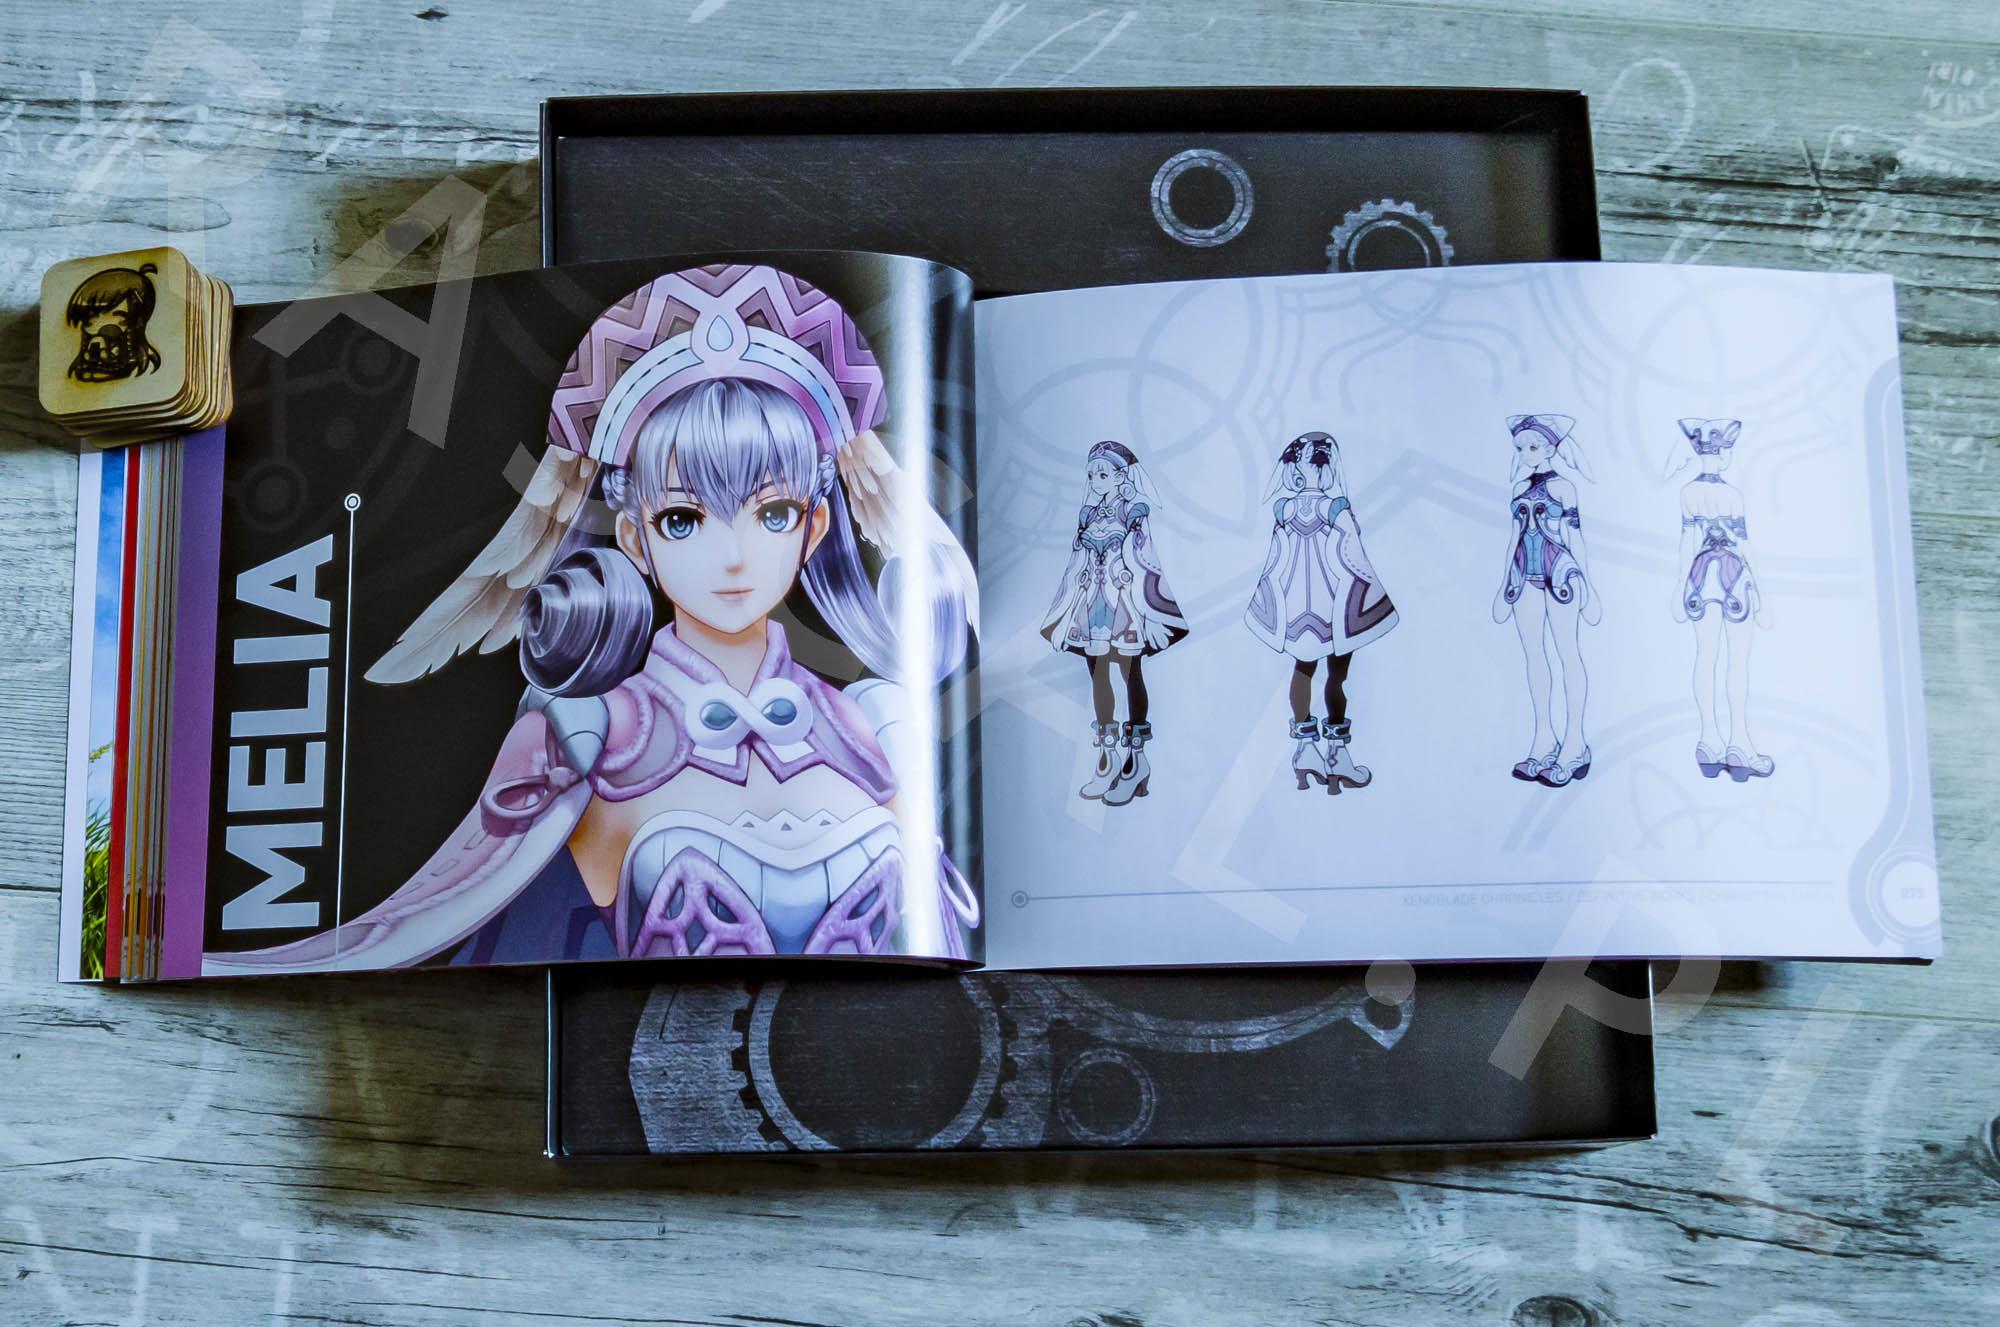 Xenoblade Chronicles Definitive Edition Collectors Set - Artbook - 08 - Melia